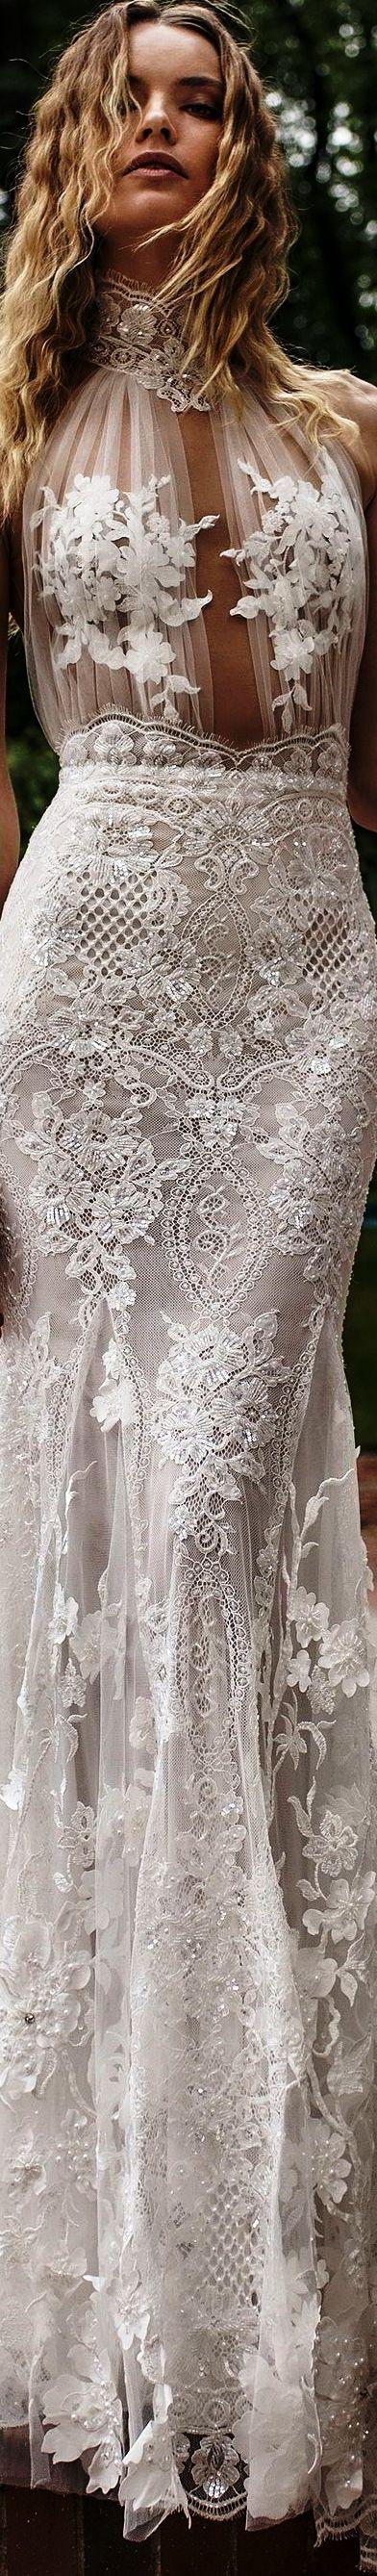 Lian rokman bridal halter high neck full embellishment